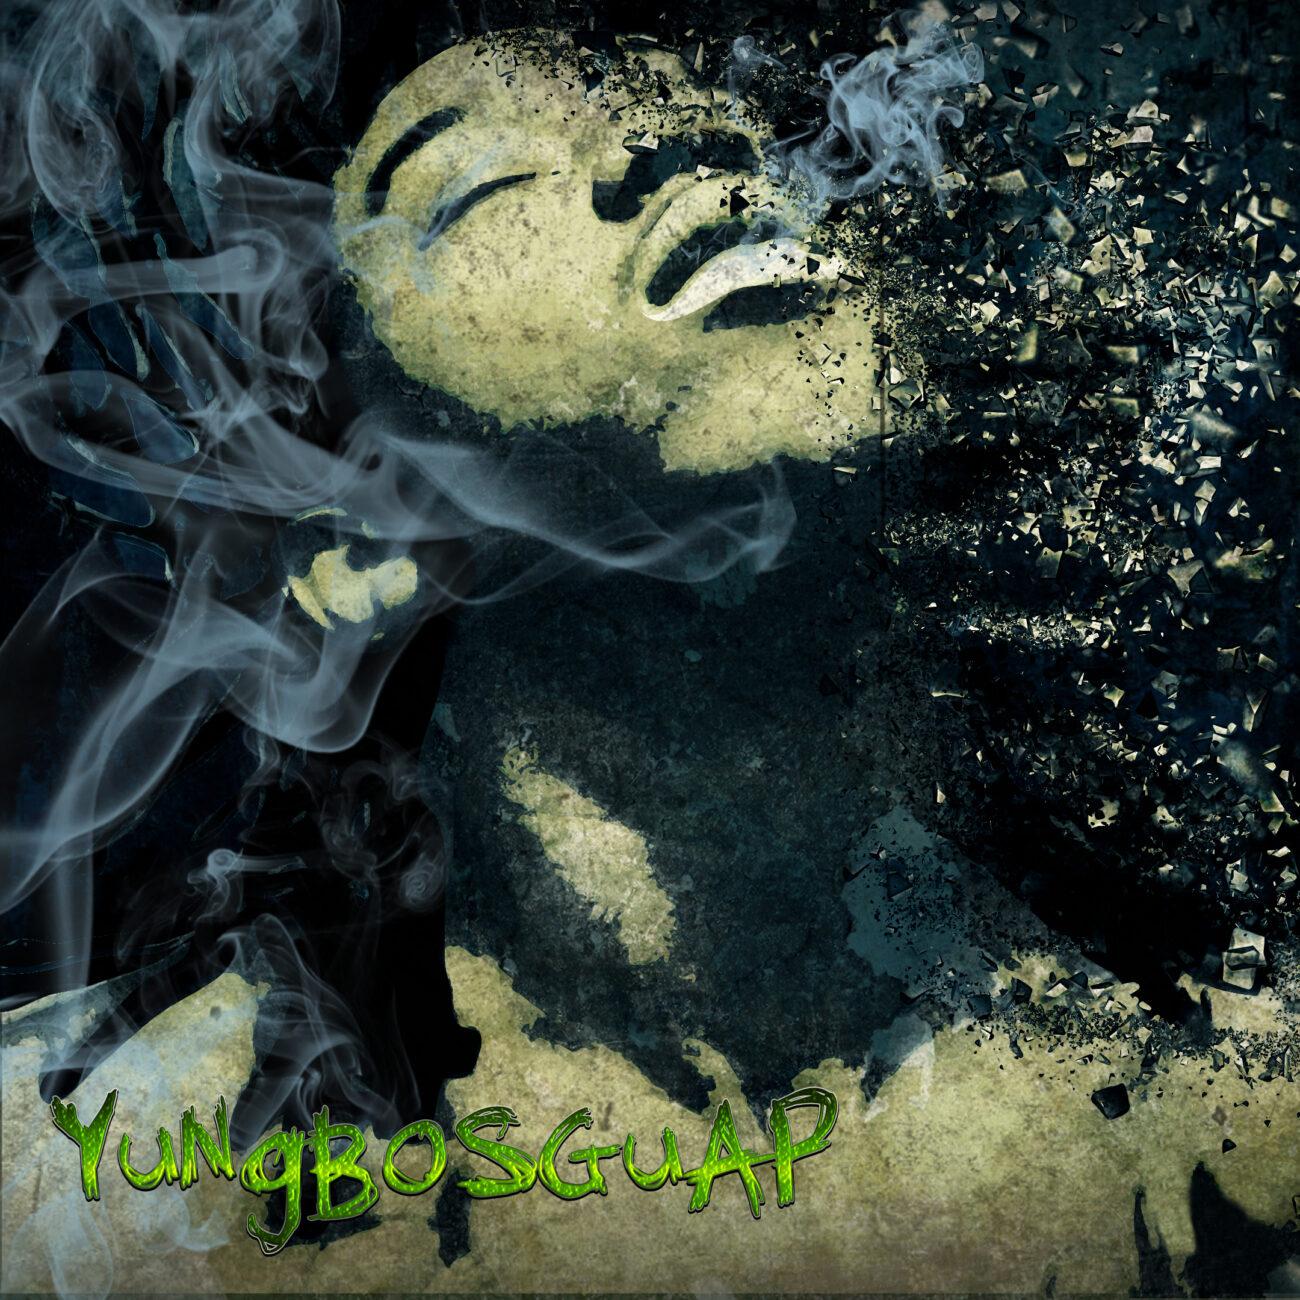 YungBosGuap(together2)_2